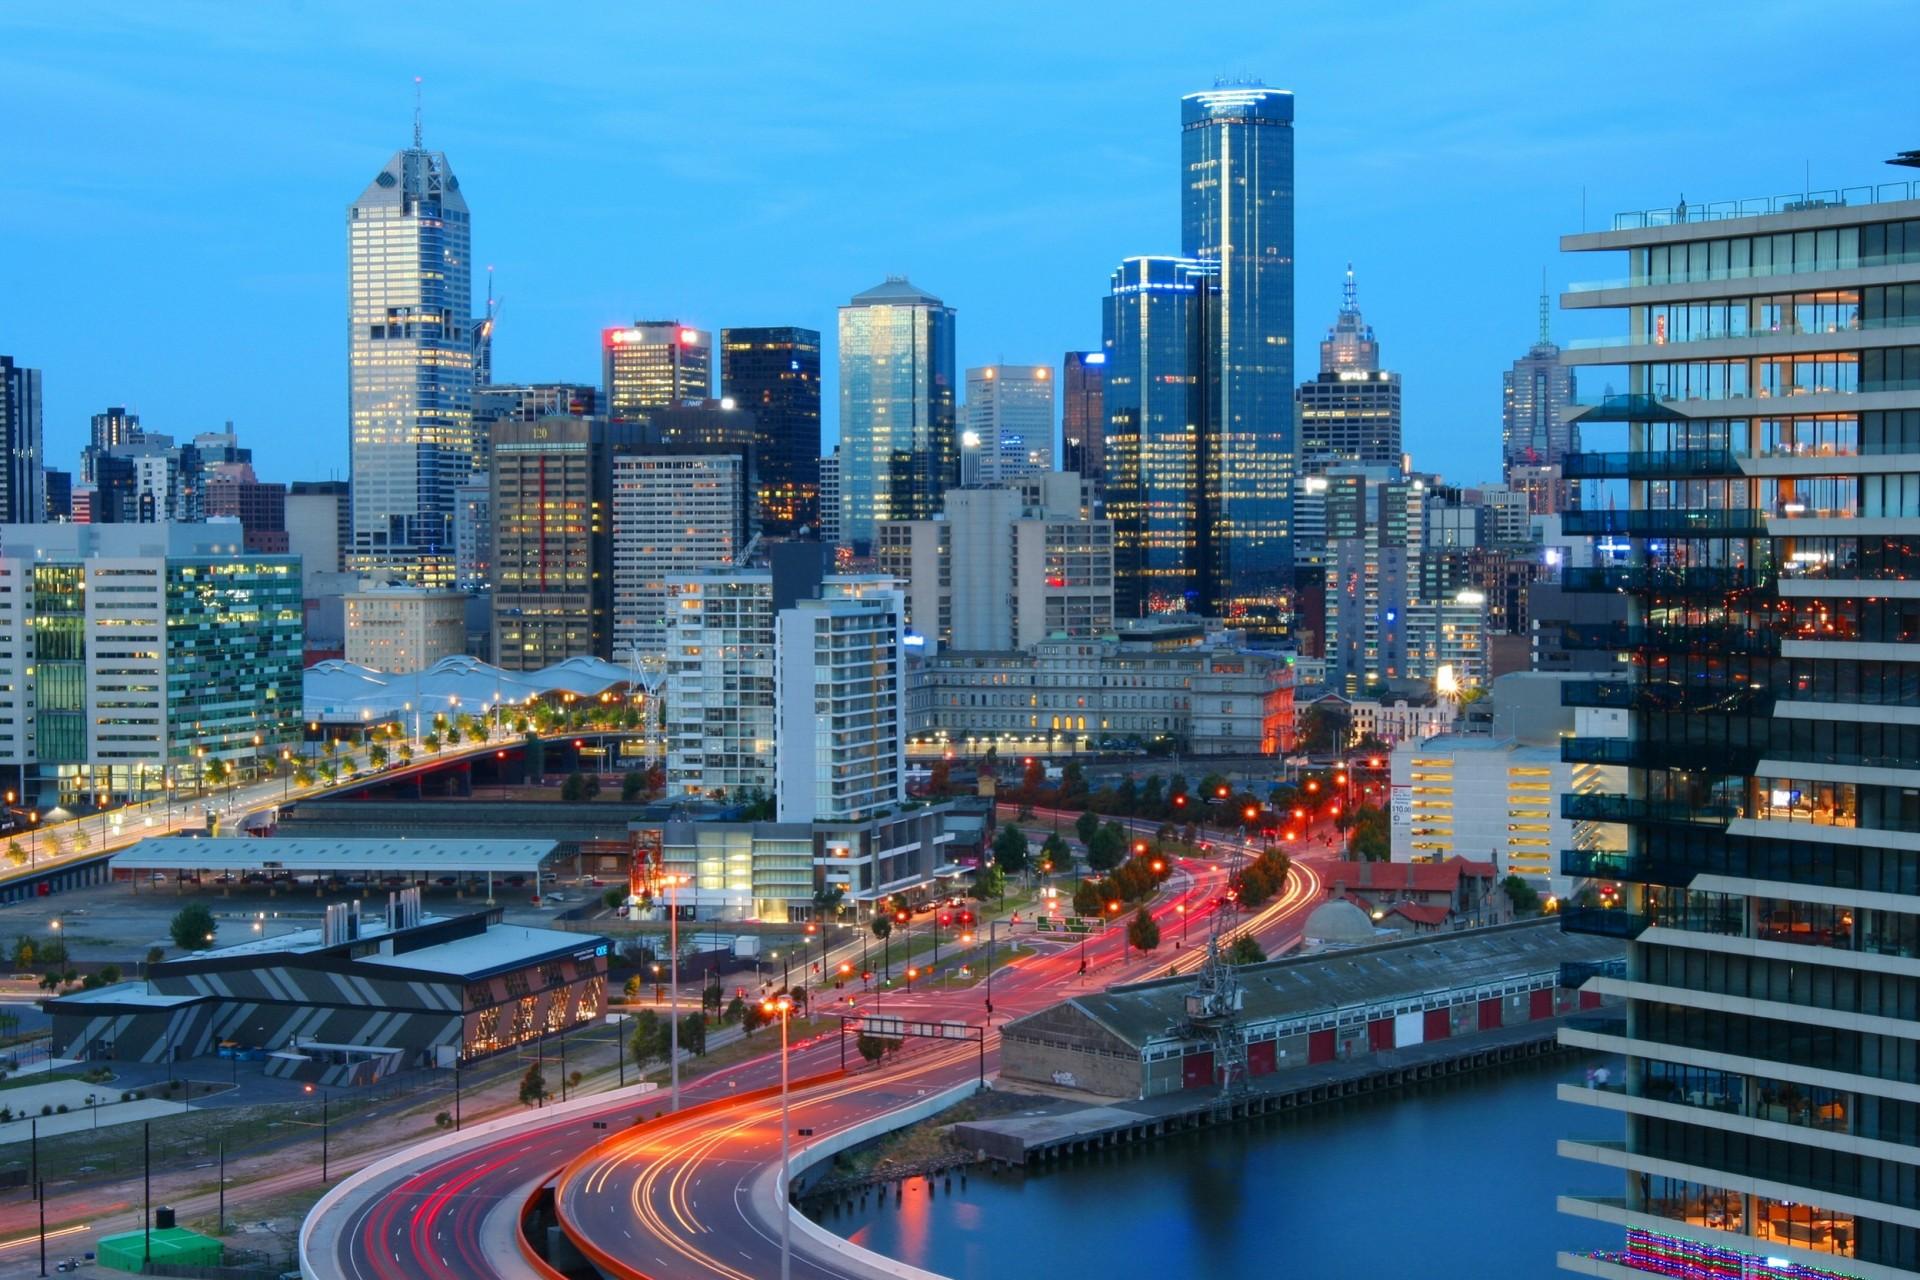 страны архитектура Австралия Мельбурн небо облака природа бесплатно